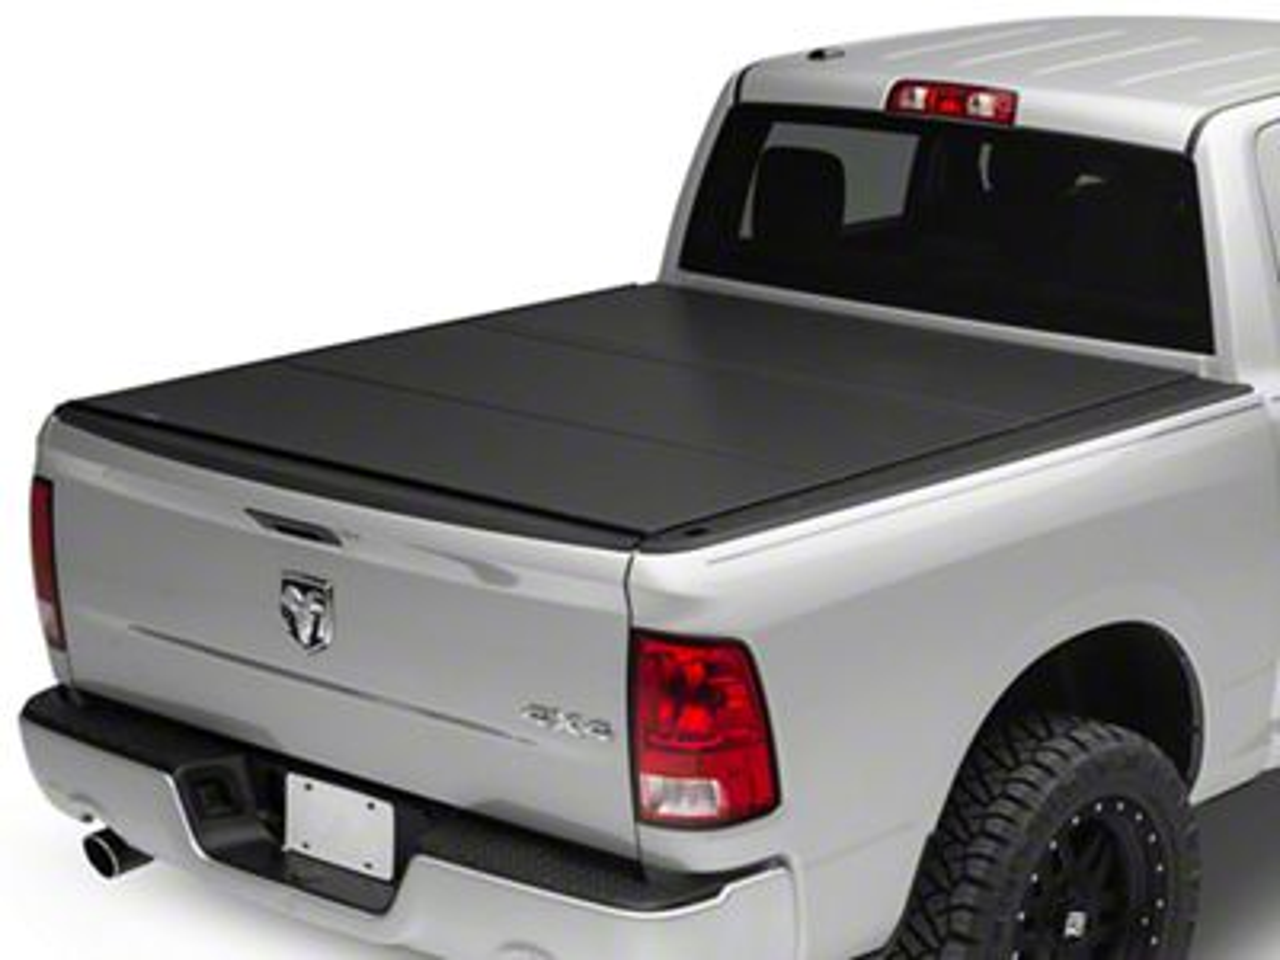 Access Hard Tri-Fold Tonneau Cover (02-18 RAM 1500 w/ 5.7 ft. & 6.5 ft. Box & w/o RAM Box)